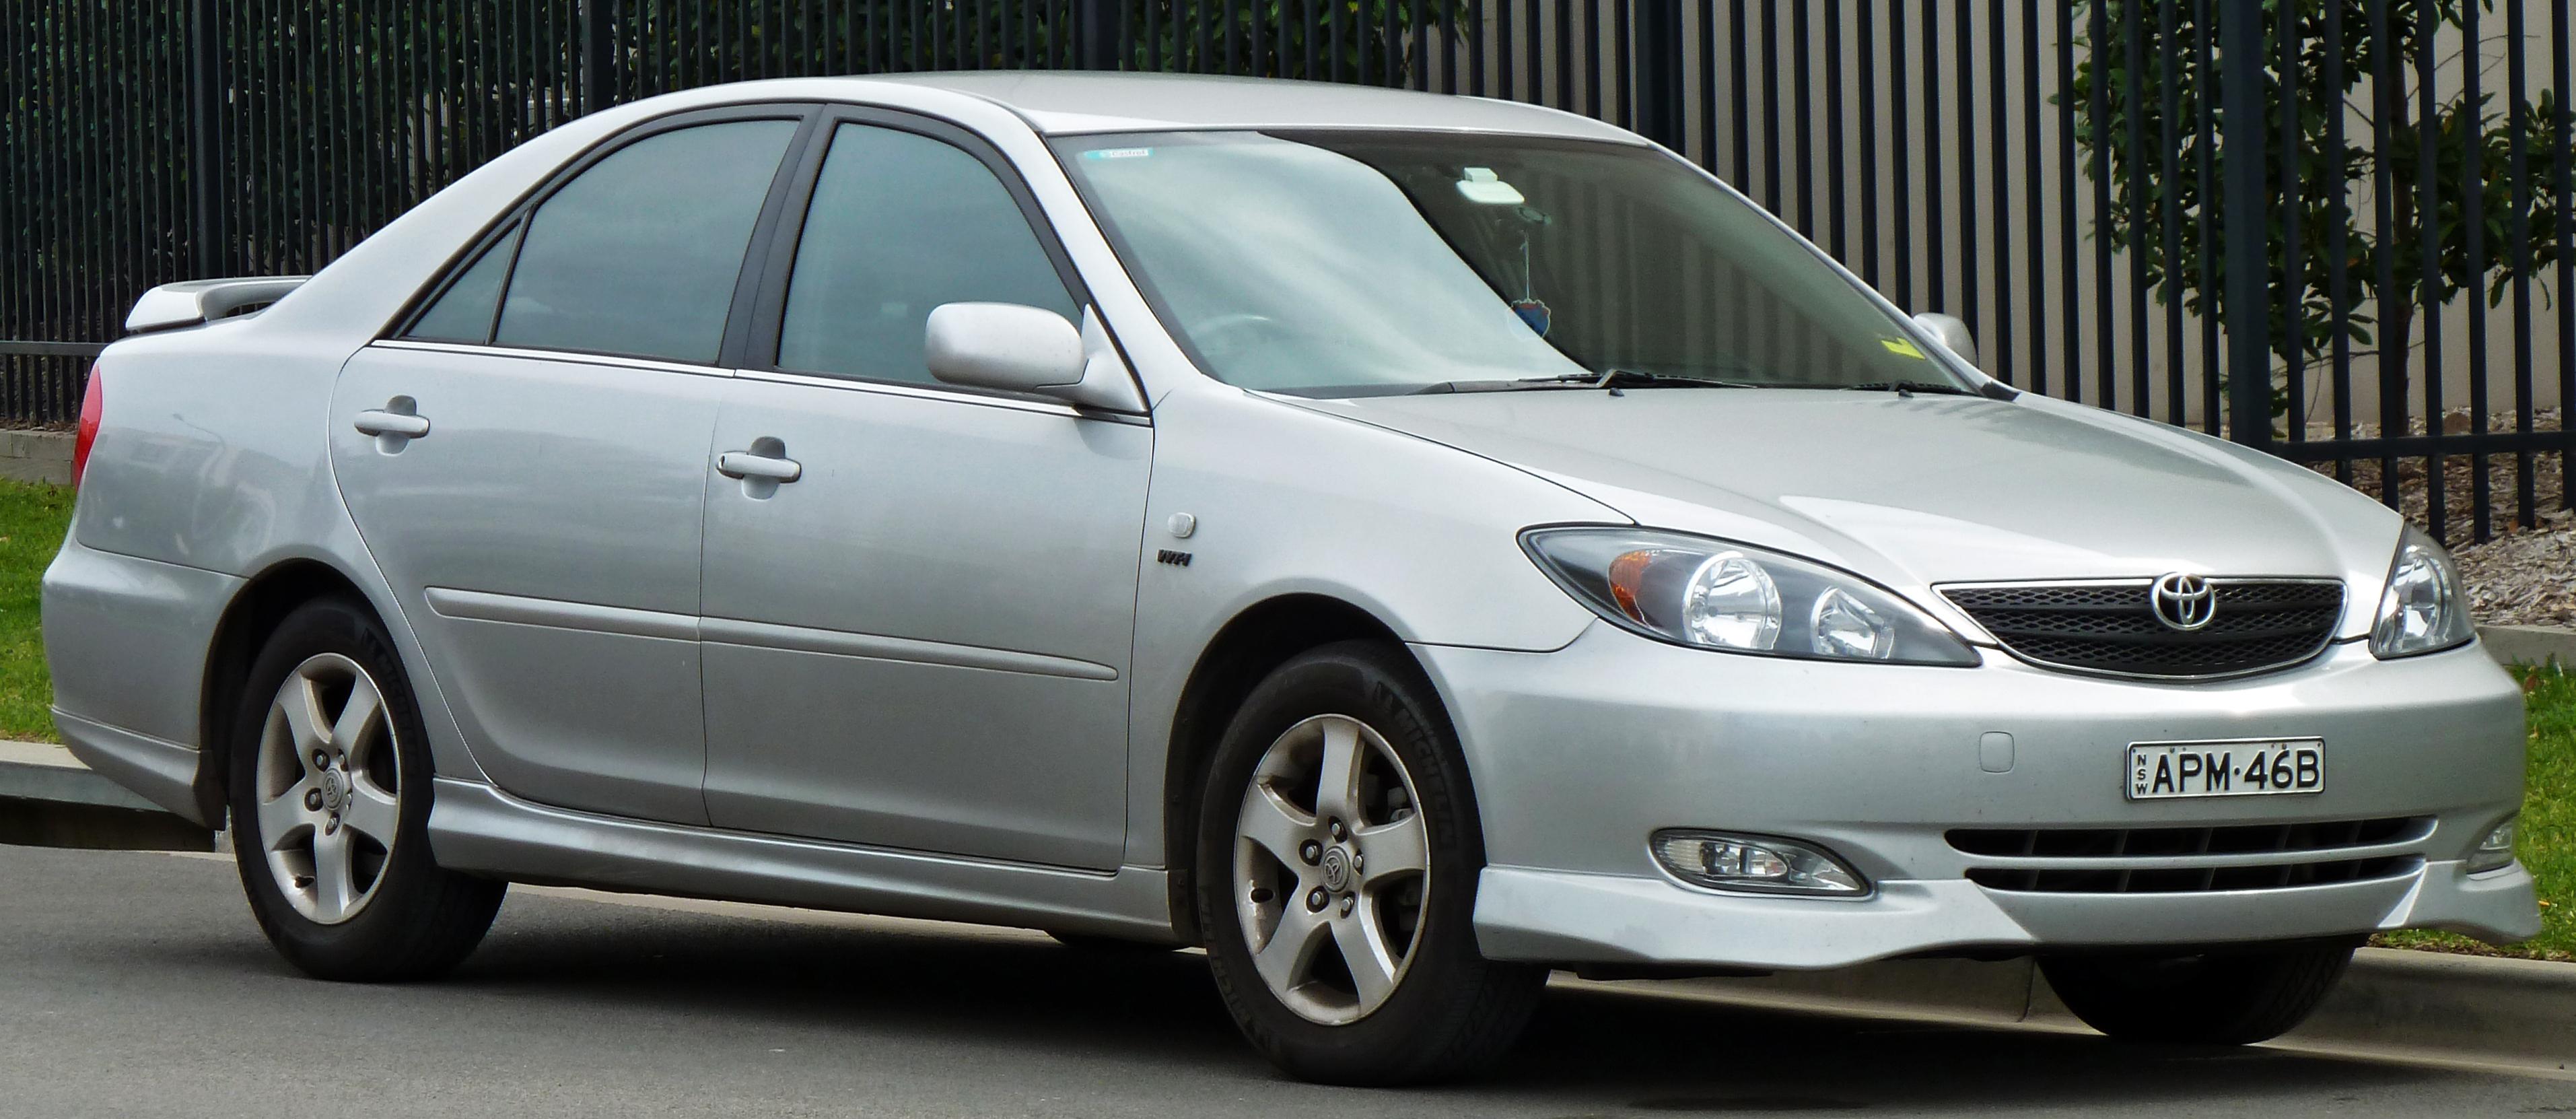 Daihatsu Altis II Restyling 2004 - 2005 Sedan #1